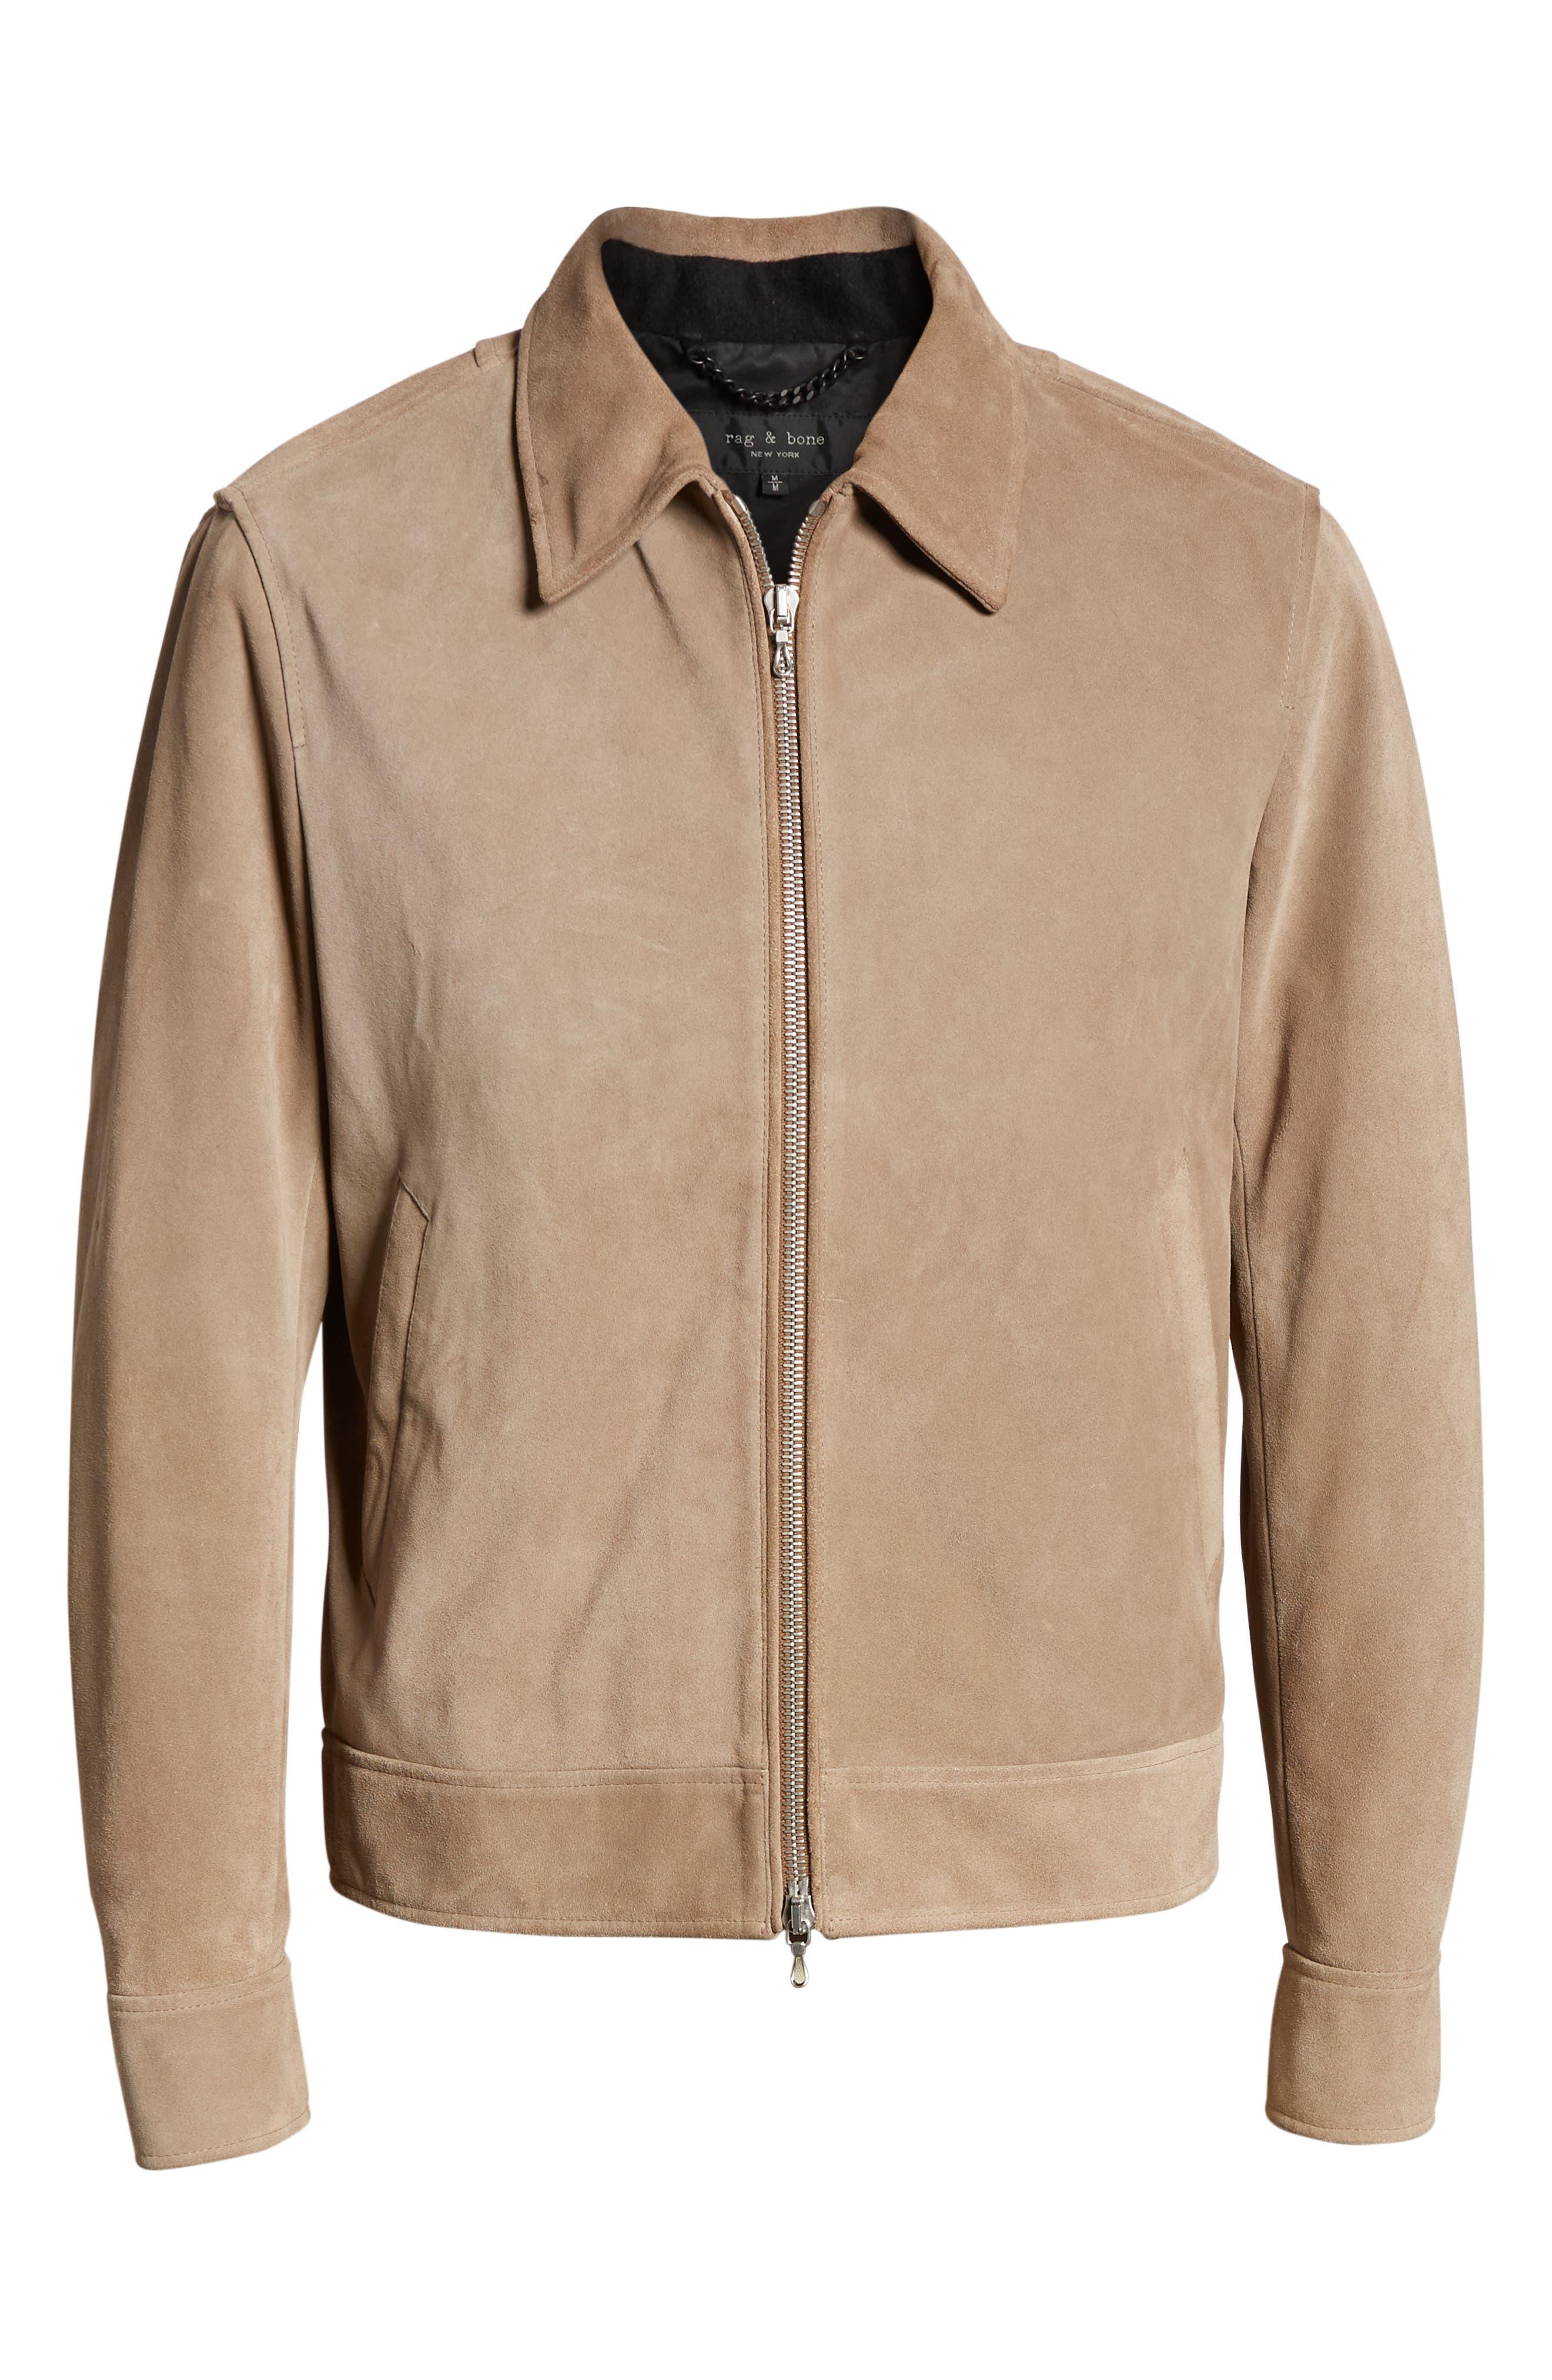 RAG & BONE,                             Regular Fit Suede Garage Jacket,                             Alternate thumbnail 6, color,                             CEMENT